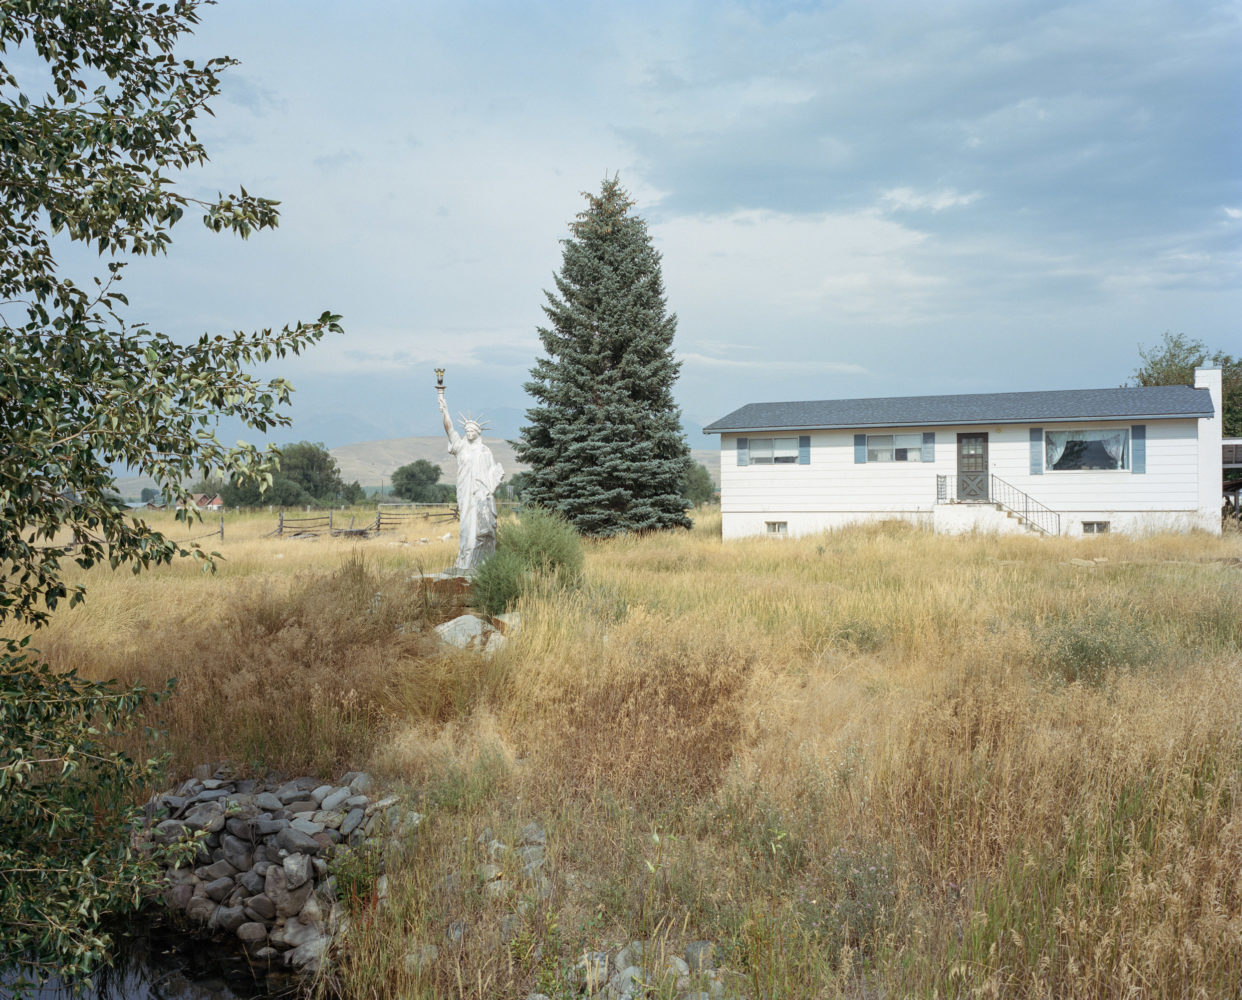 Статуя свободы, Салмон, штат Айдахо